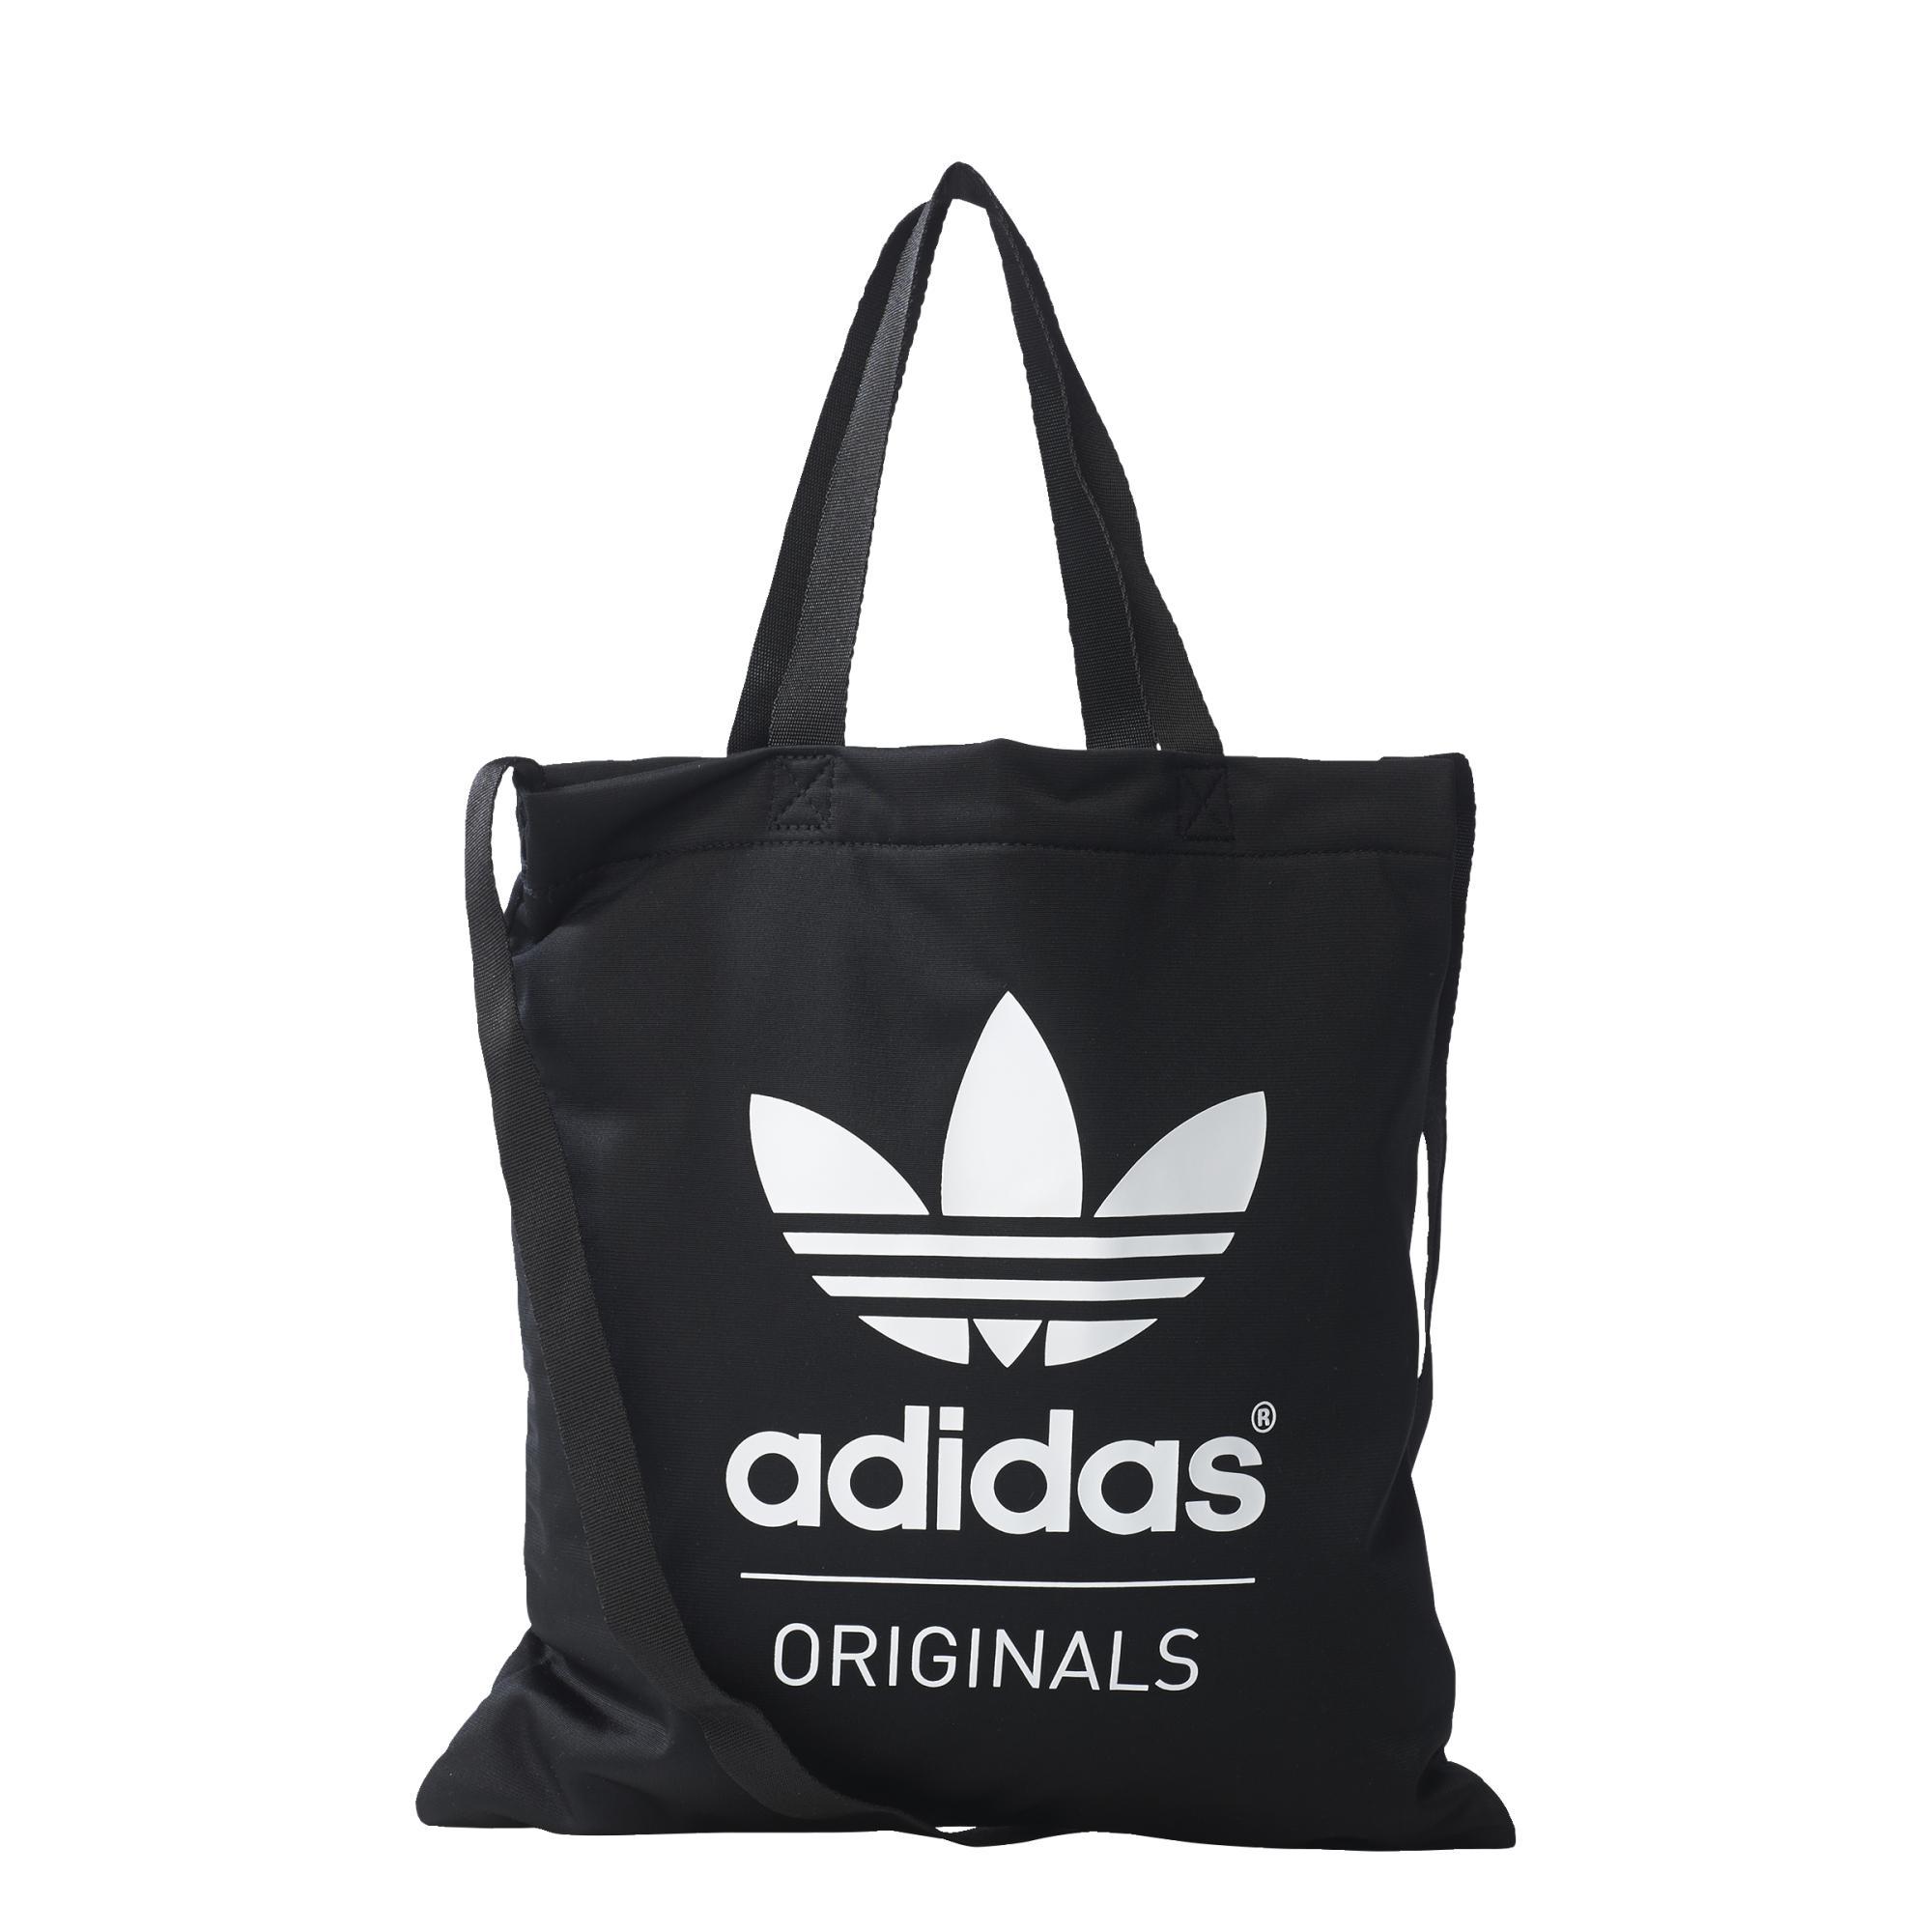 Adidas Originals Bolso Streetnegroblanco Classic Shopper zGpqVSMU